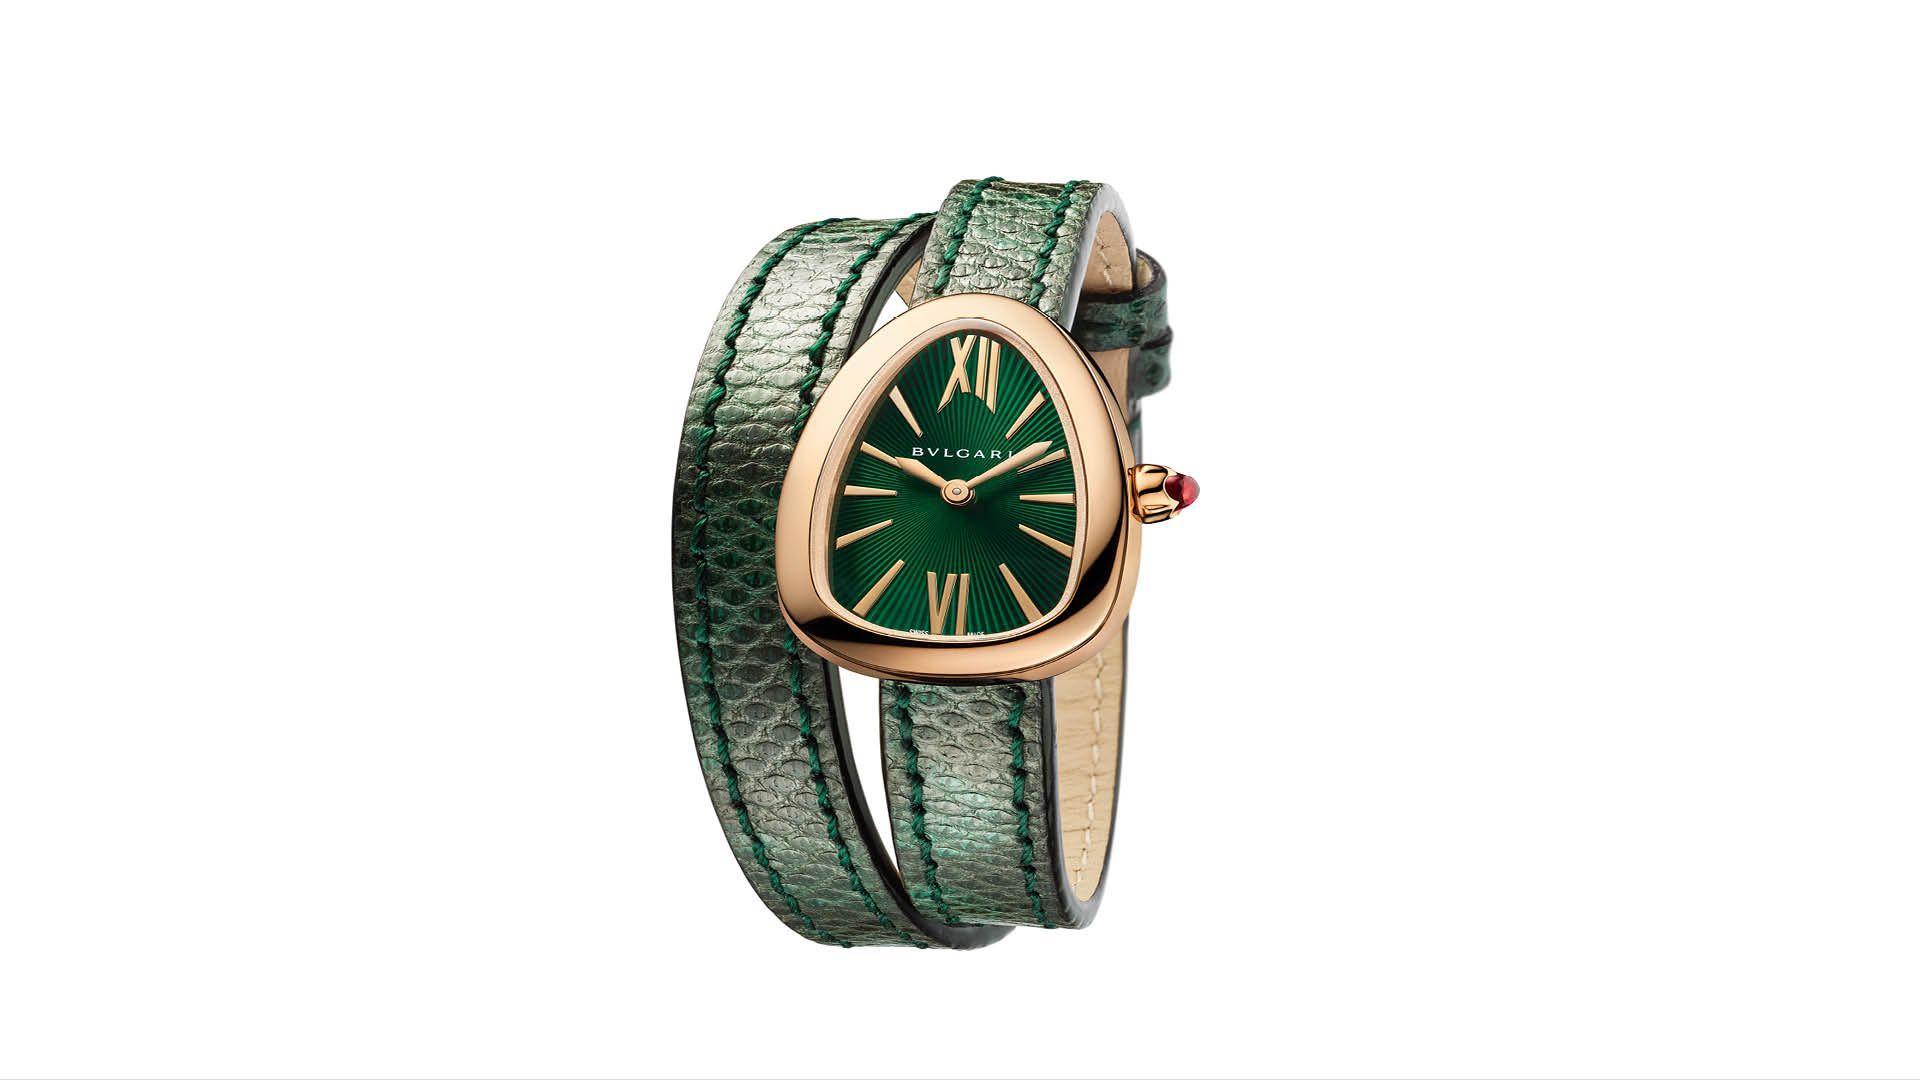 Bulgari-Serpenti-Watch-Green